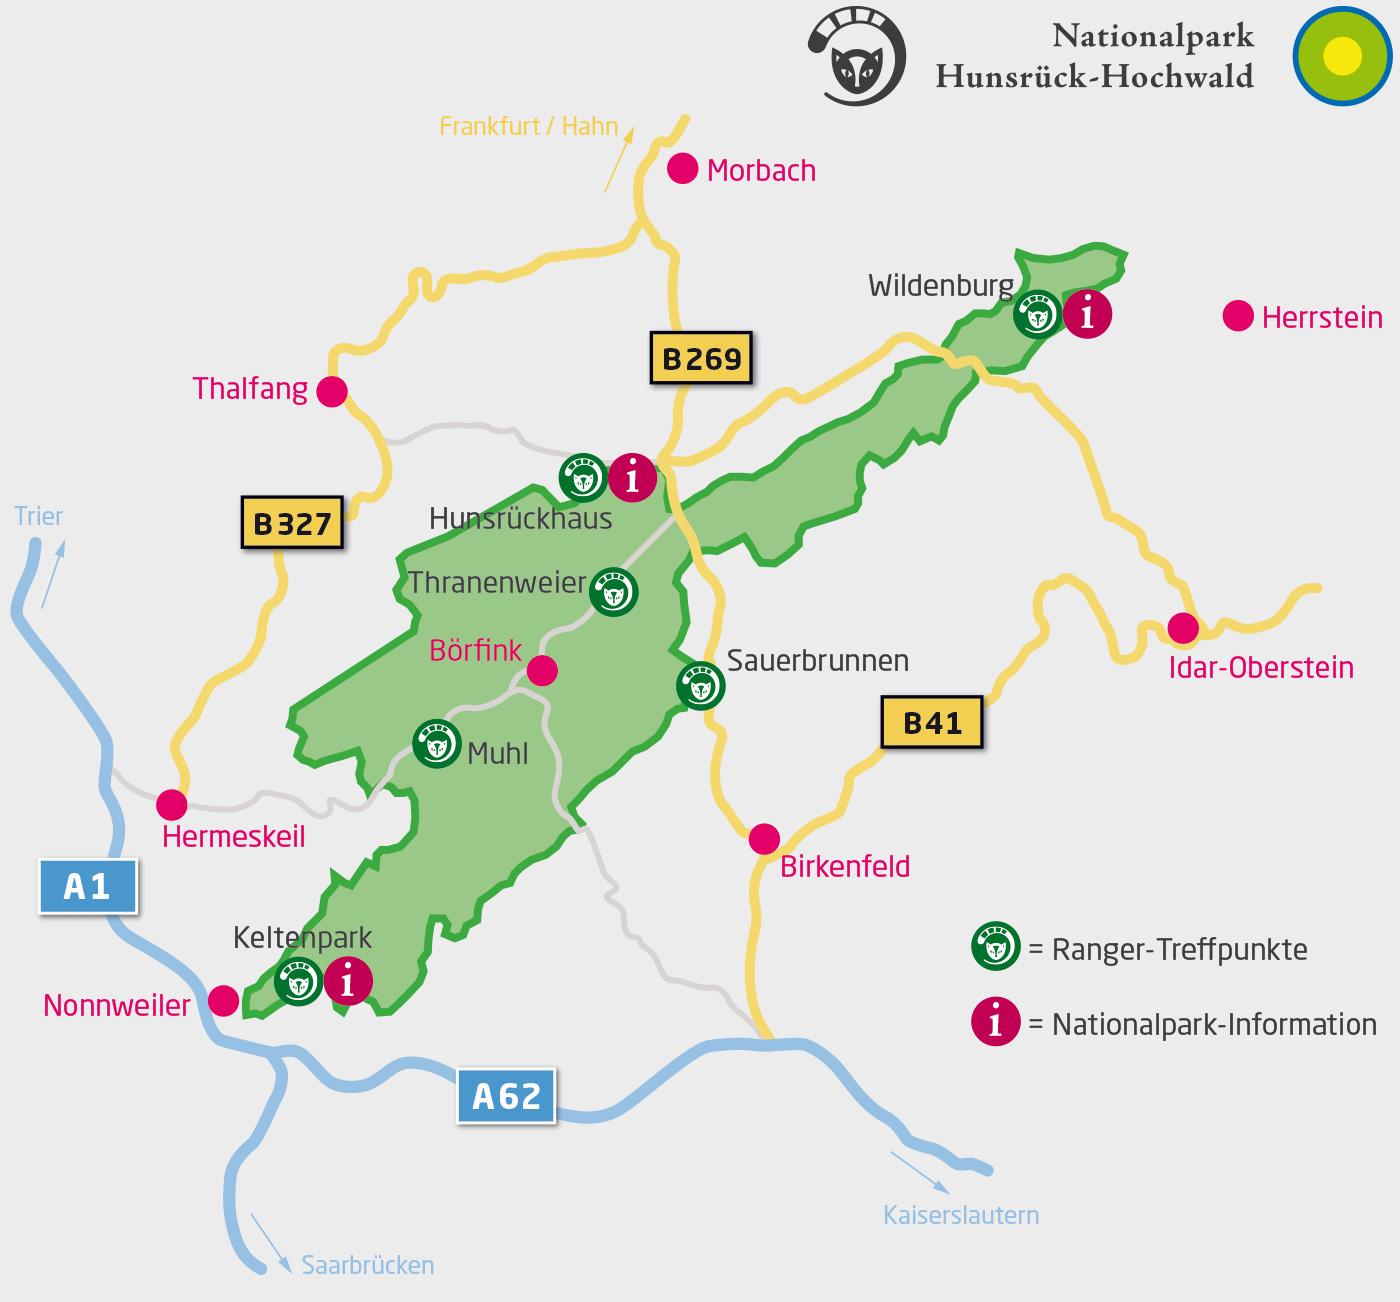 Hunsrück Hochwald Karte.Outdoor Nationalpark Hunsrück Hochwald Nationalpark Hunsrück